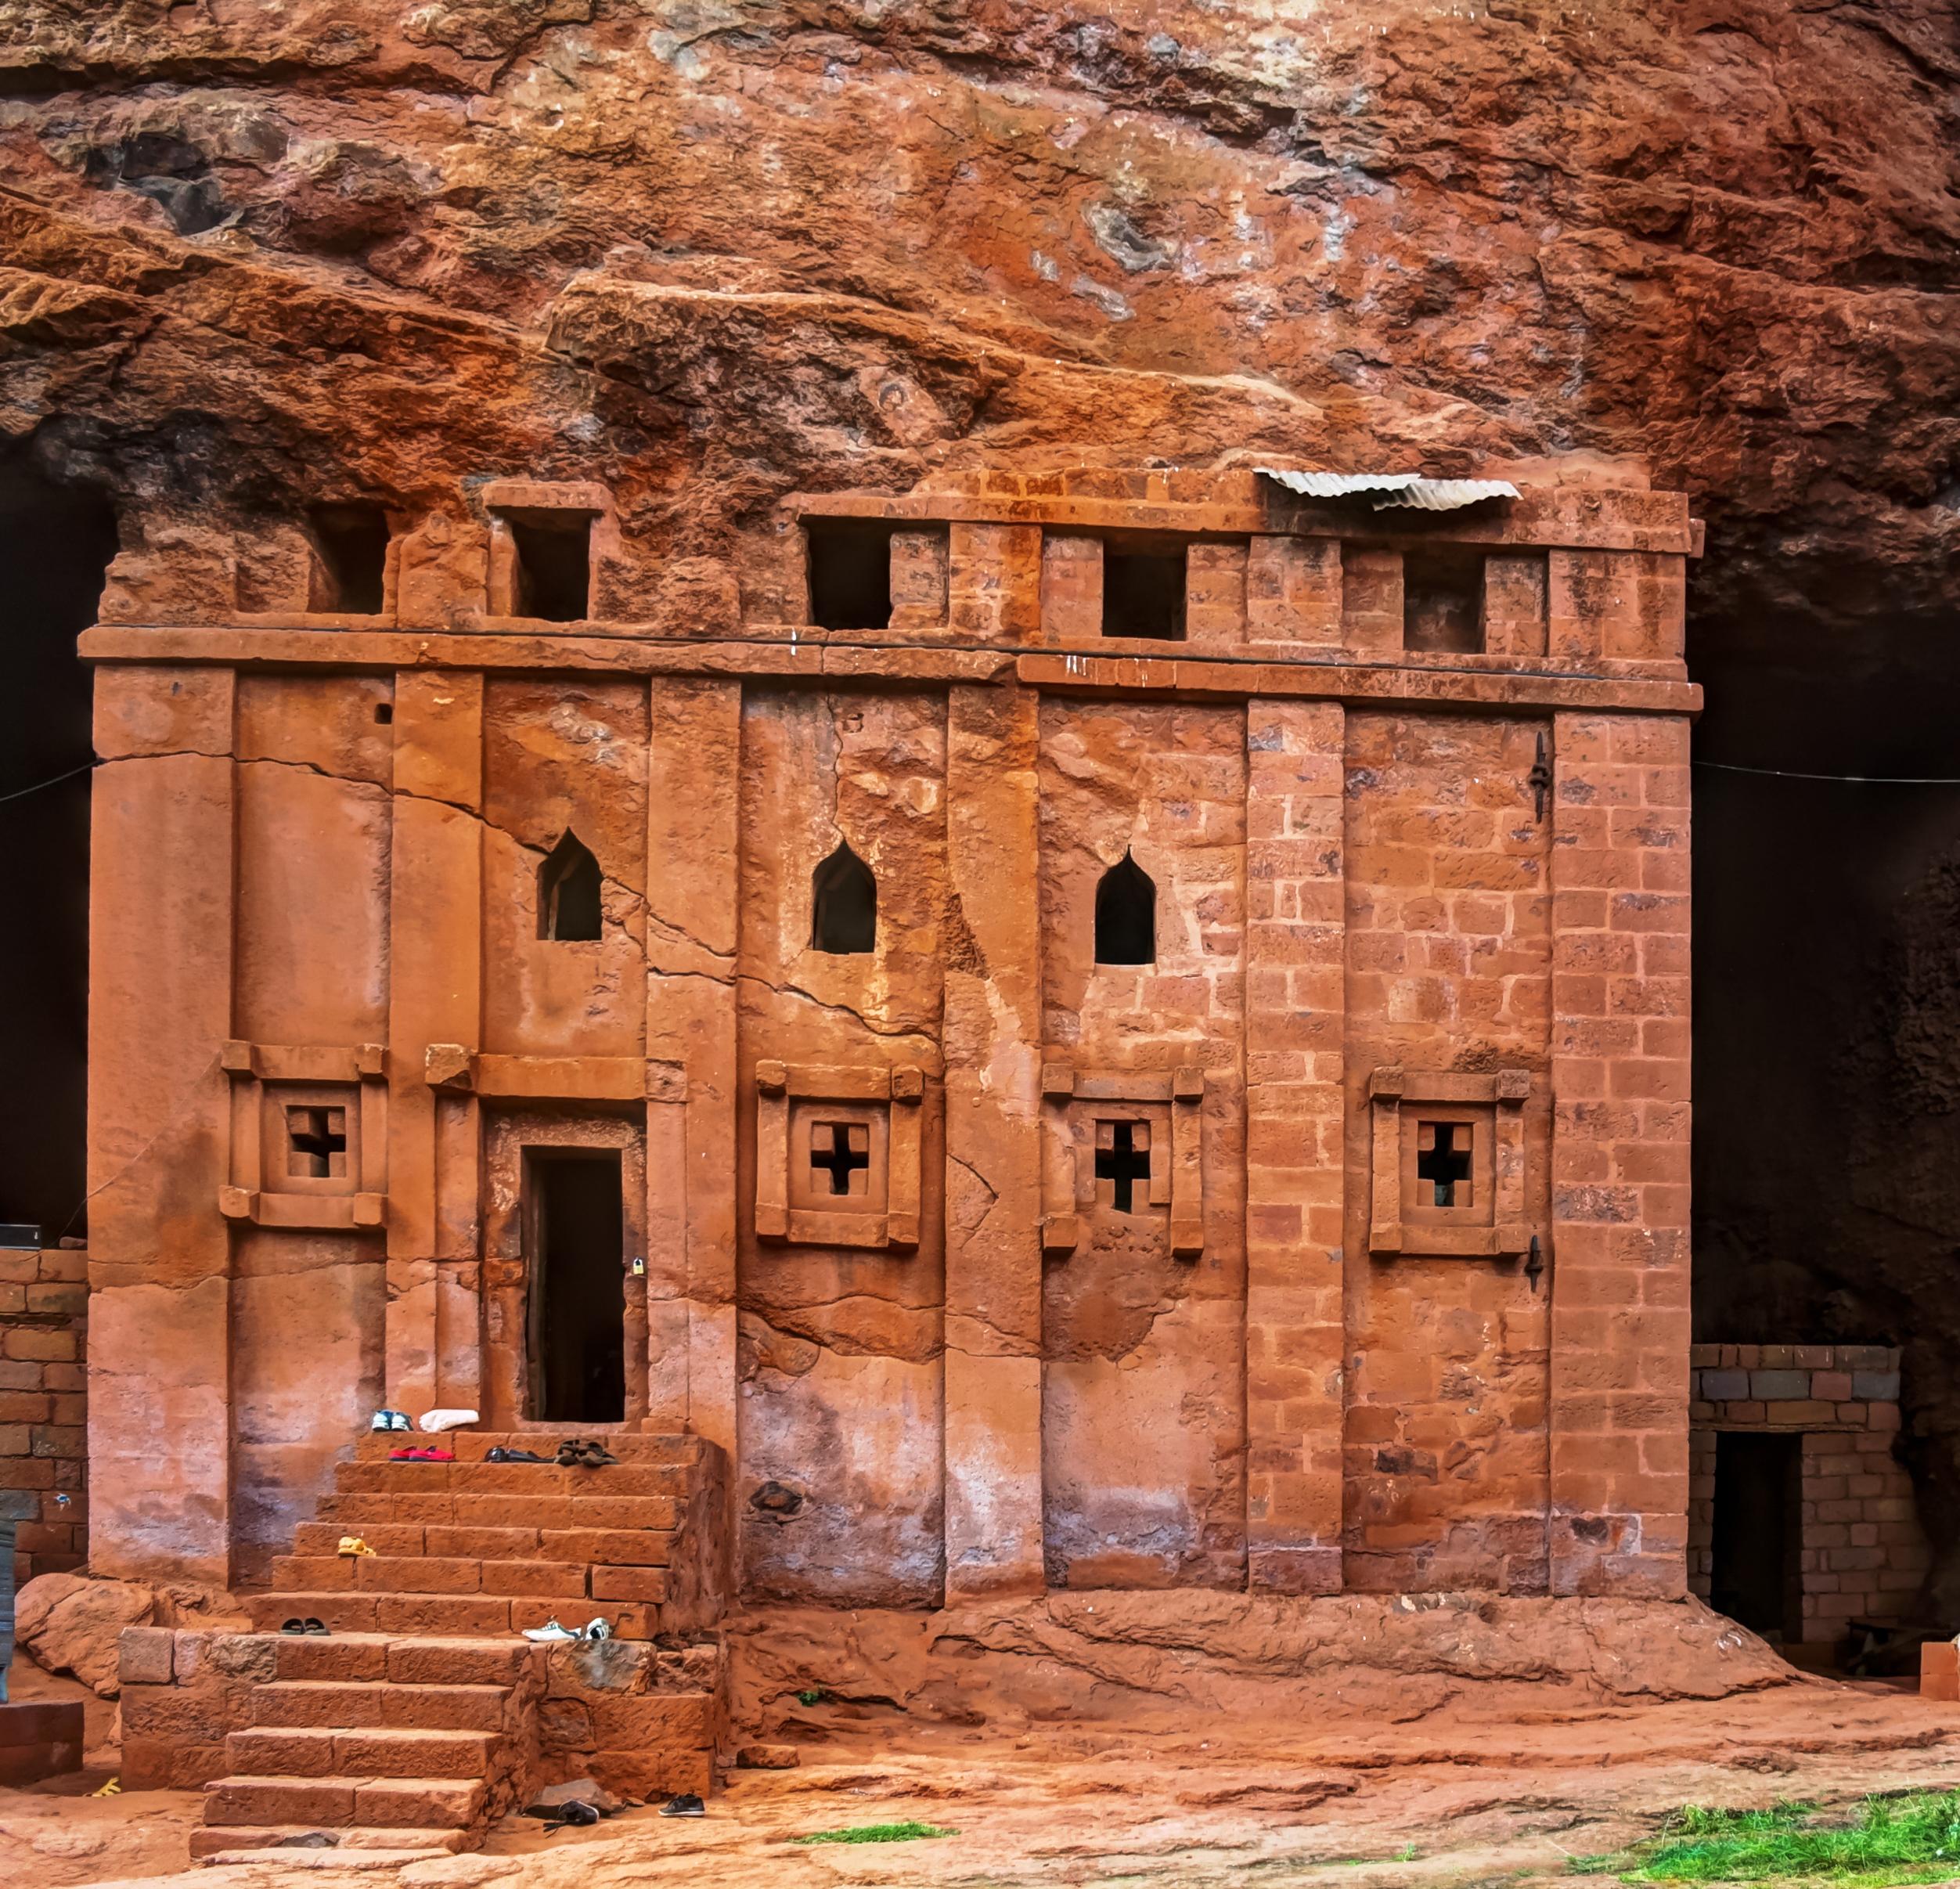 Bete-Abba-Libanos-rock-hewn-church,-Lalibela-Ethiopia-618056636_2504x2413